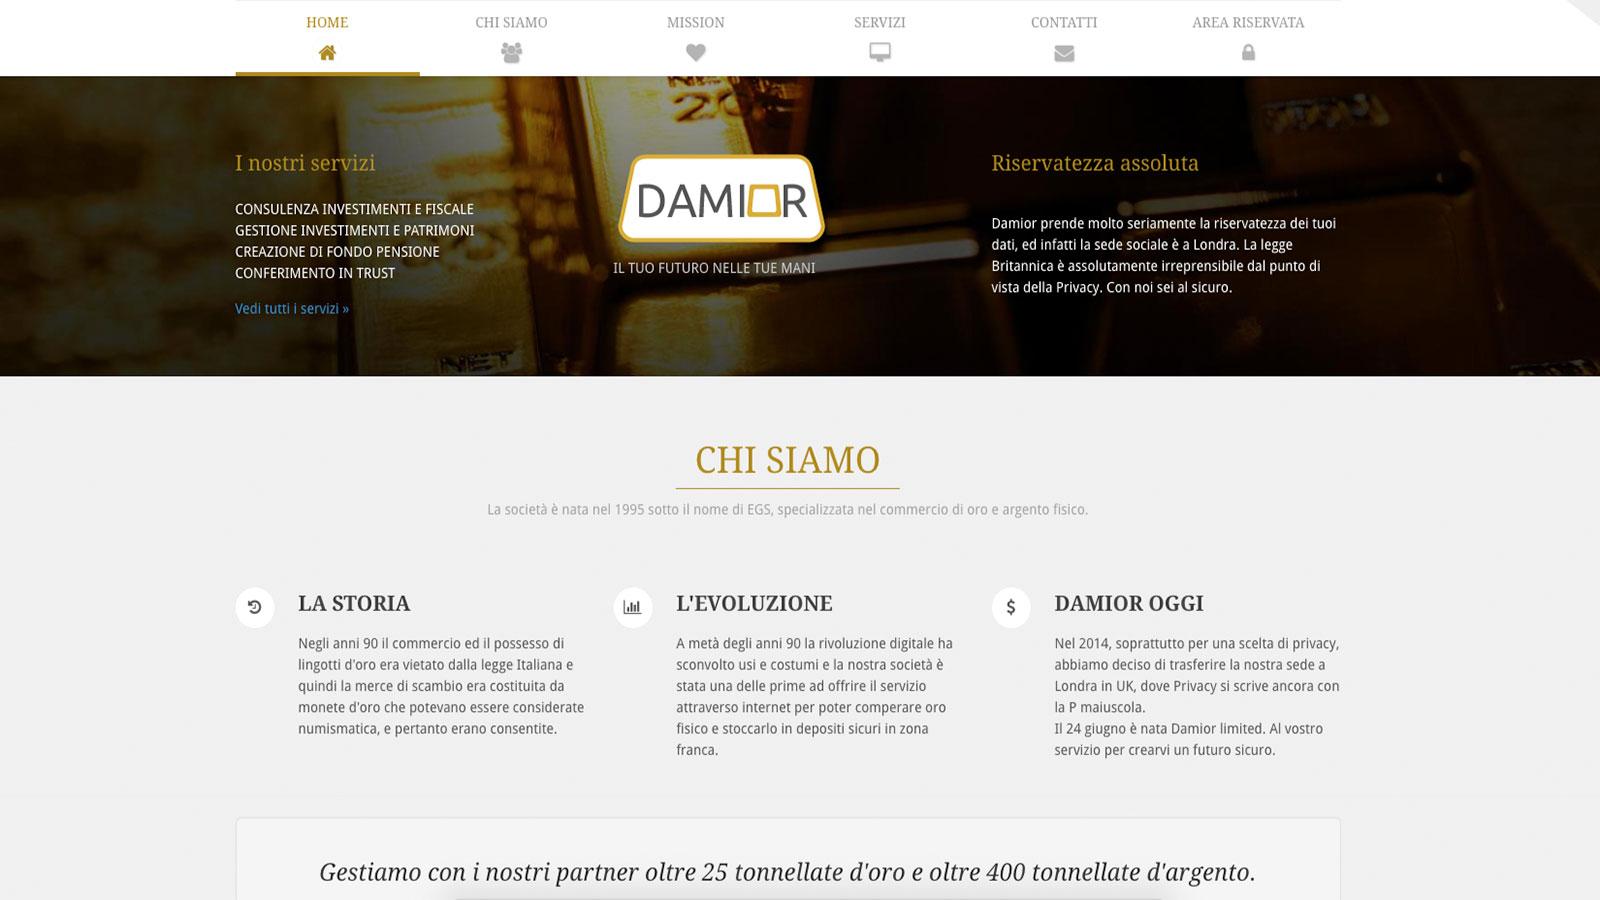 Damior